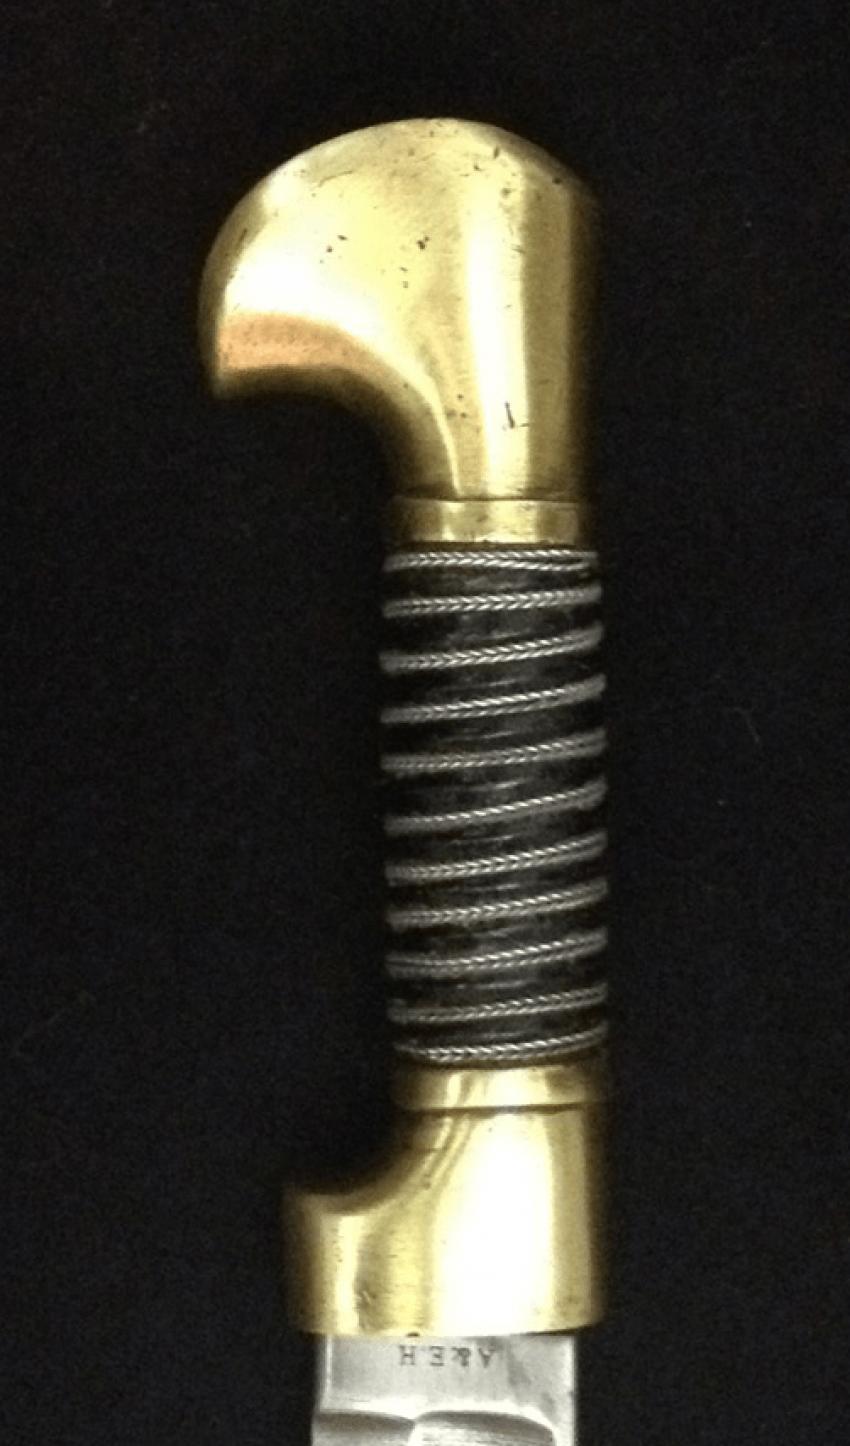 Saber Cossack sample 1838 in sheath. - photo 3